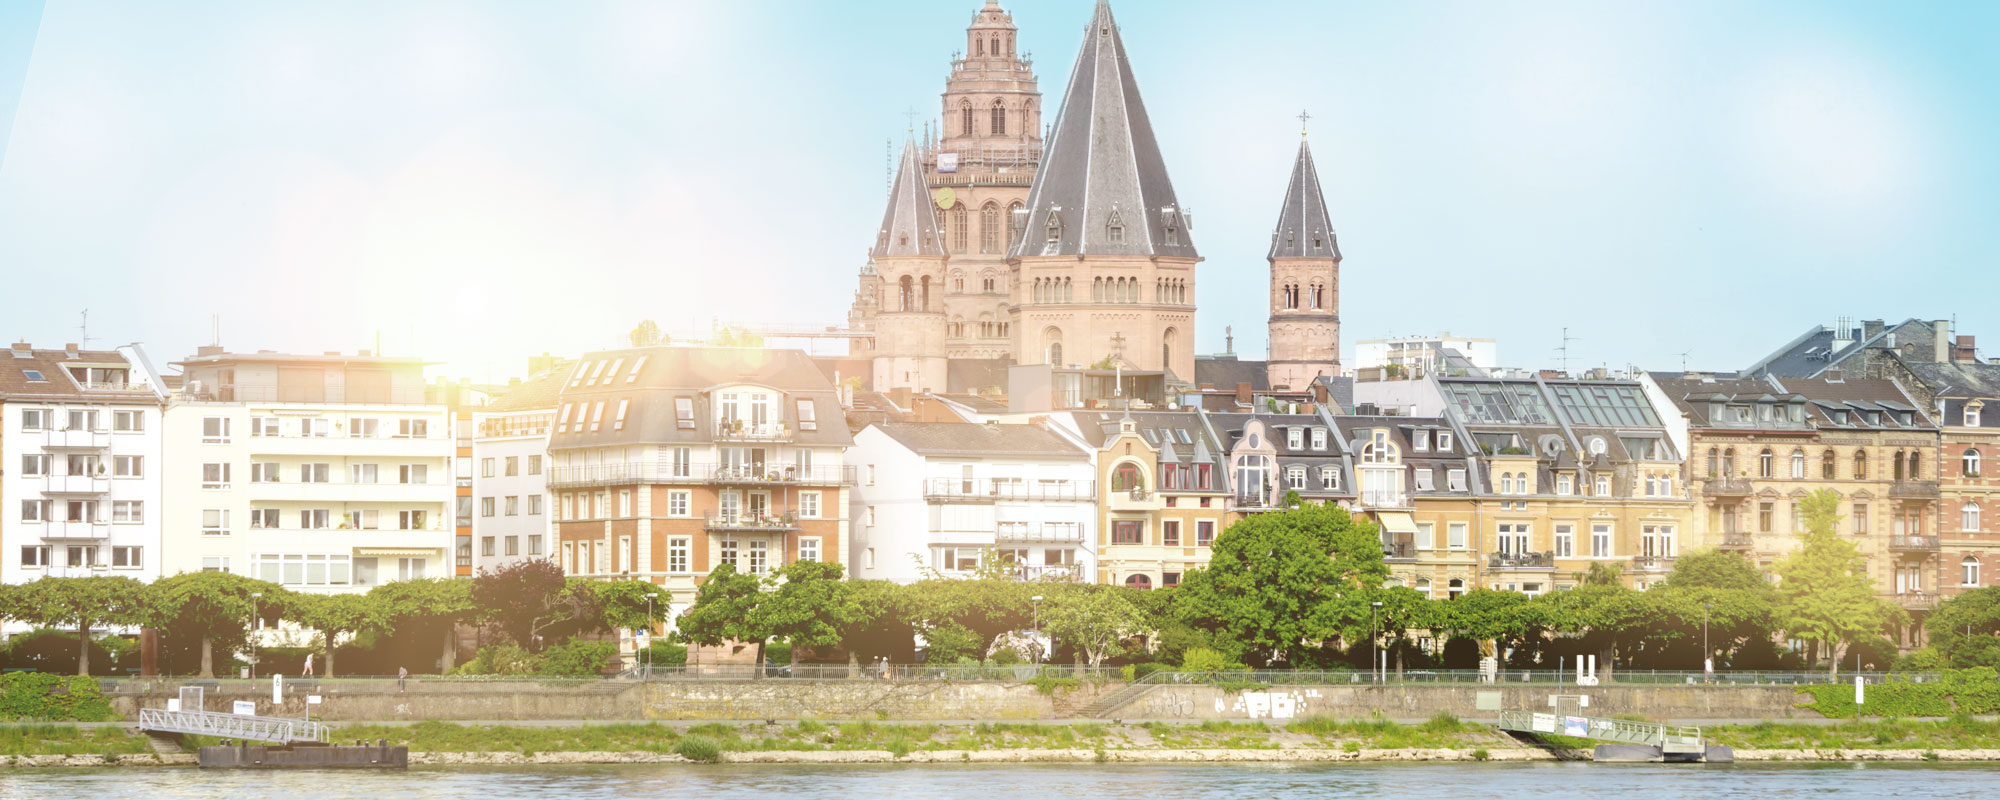 Www.Wetter.Com Mainz